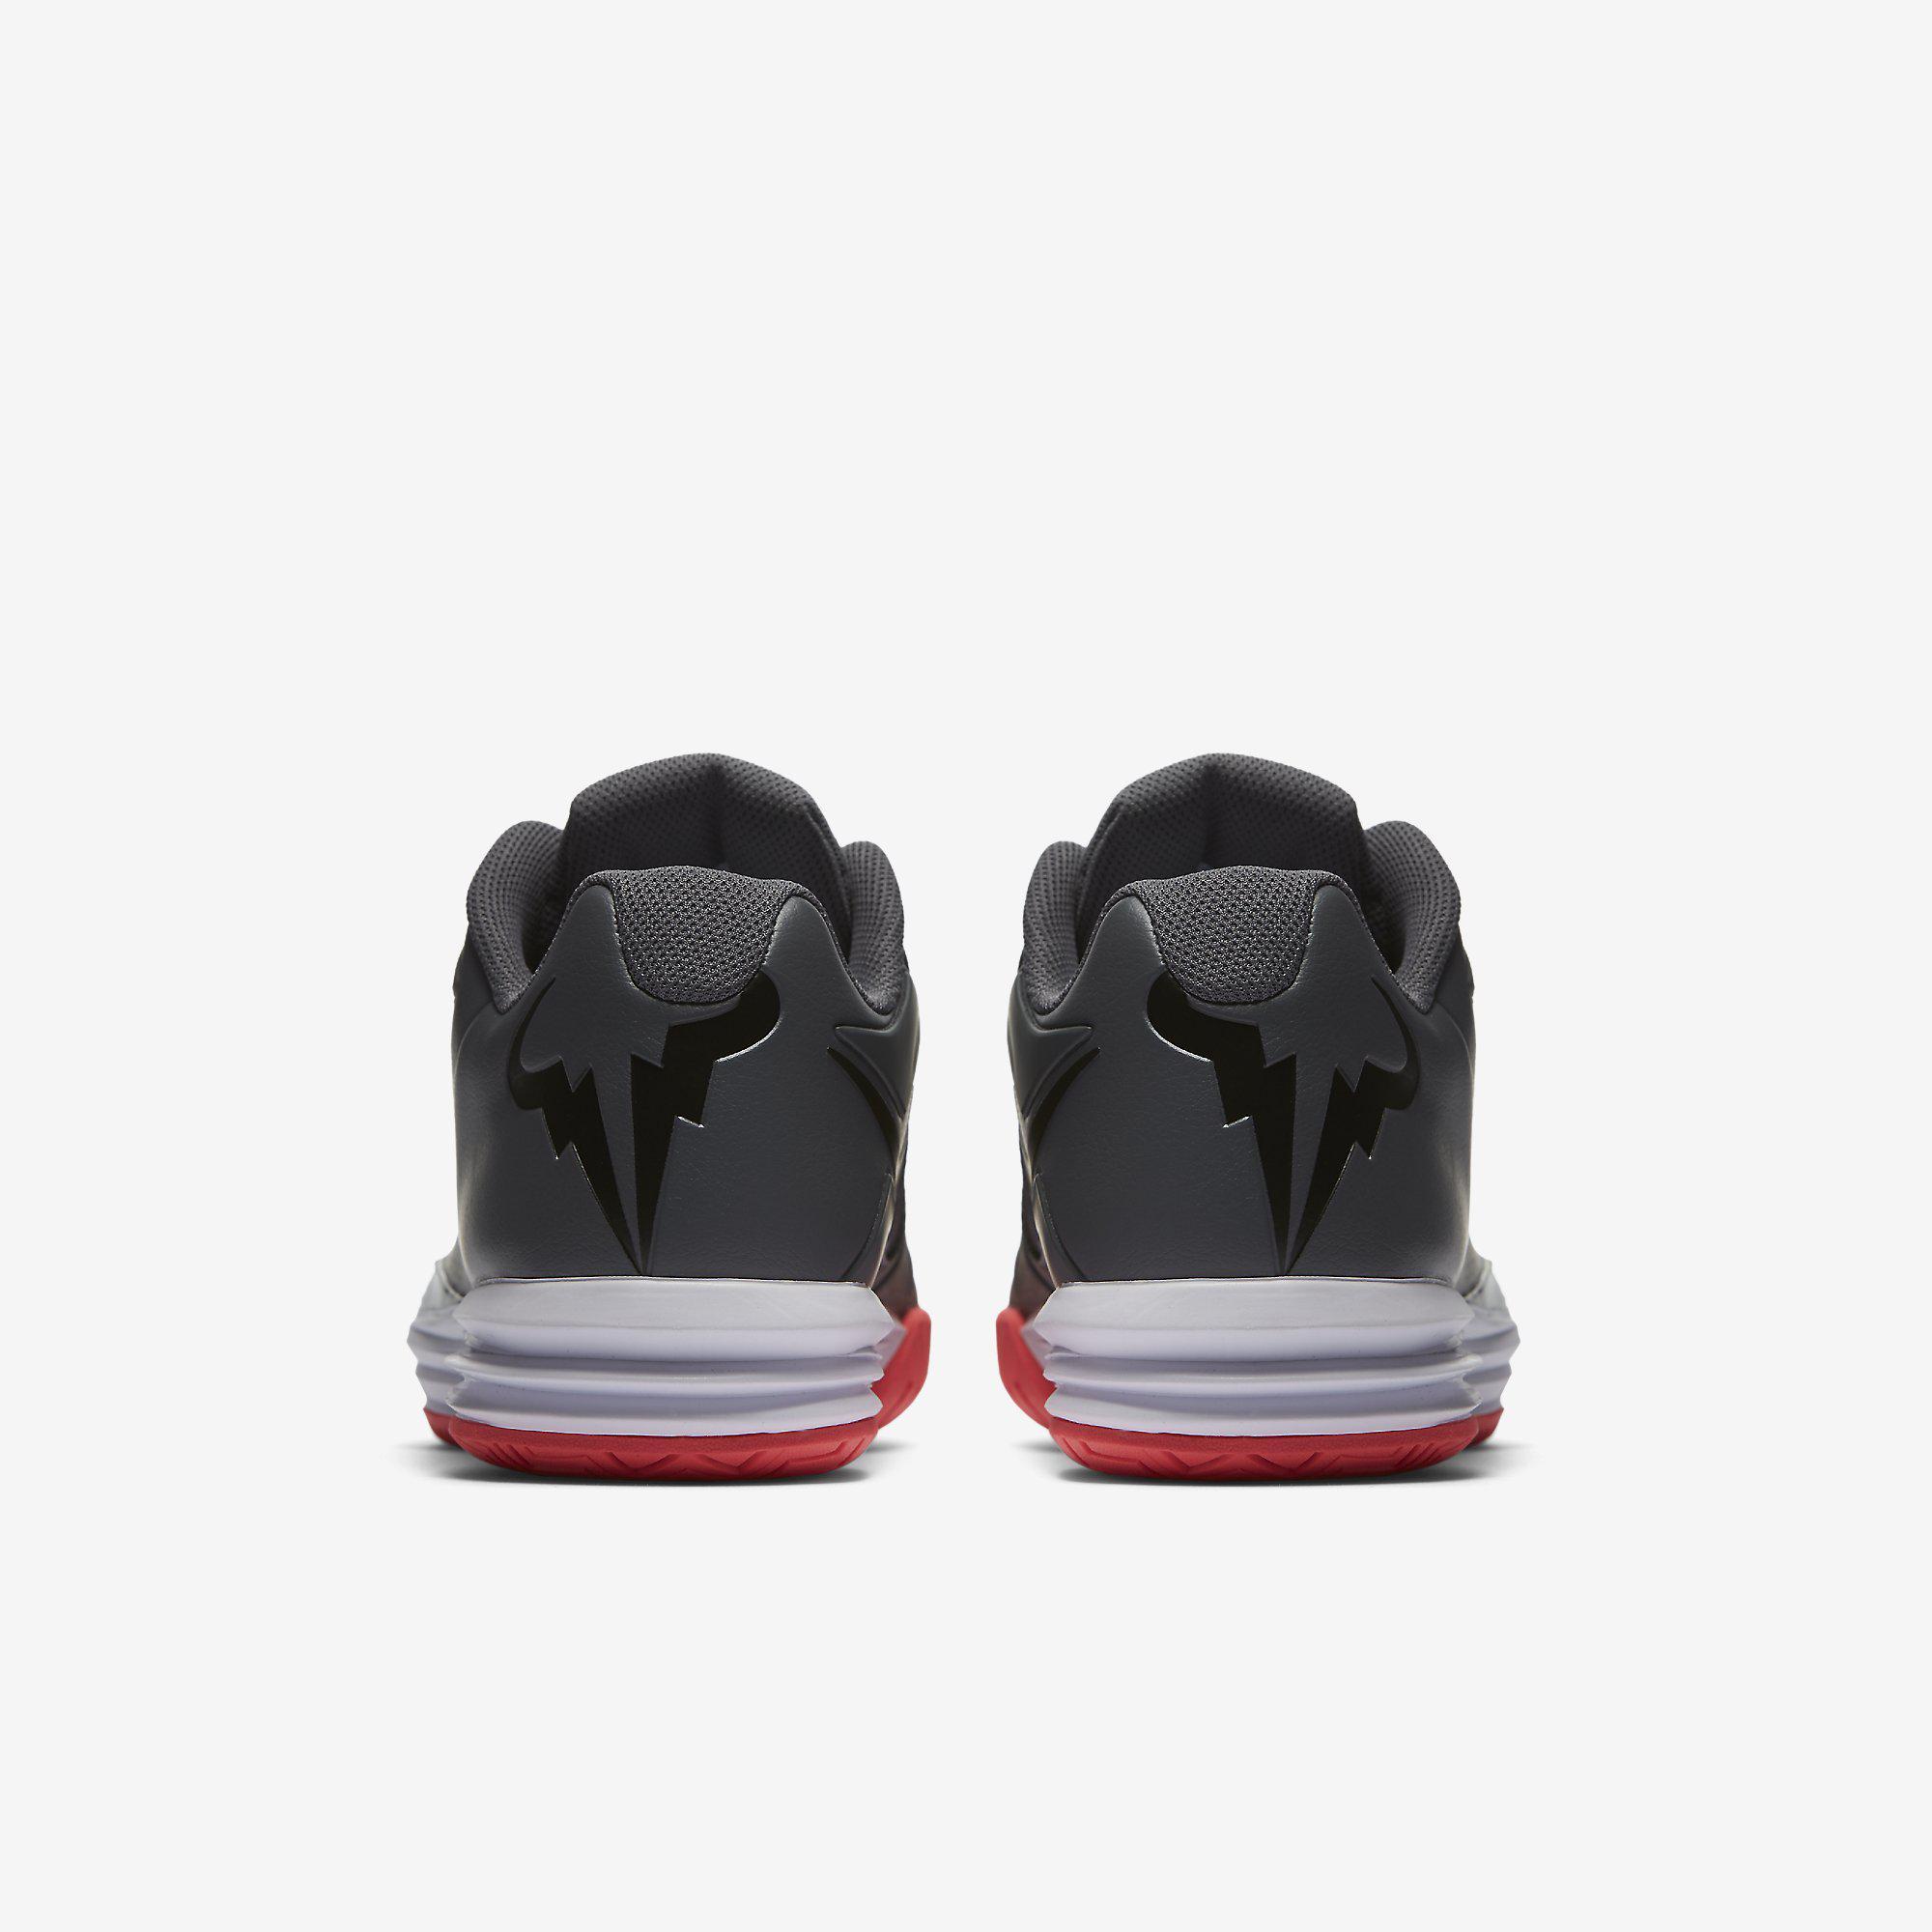 7e48887156da Nike Mens Lunar Ballistec 1.5 Legend Rafa Tennis Shoes - Dark Grey ...